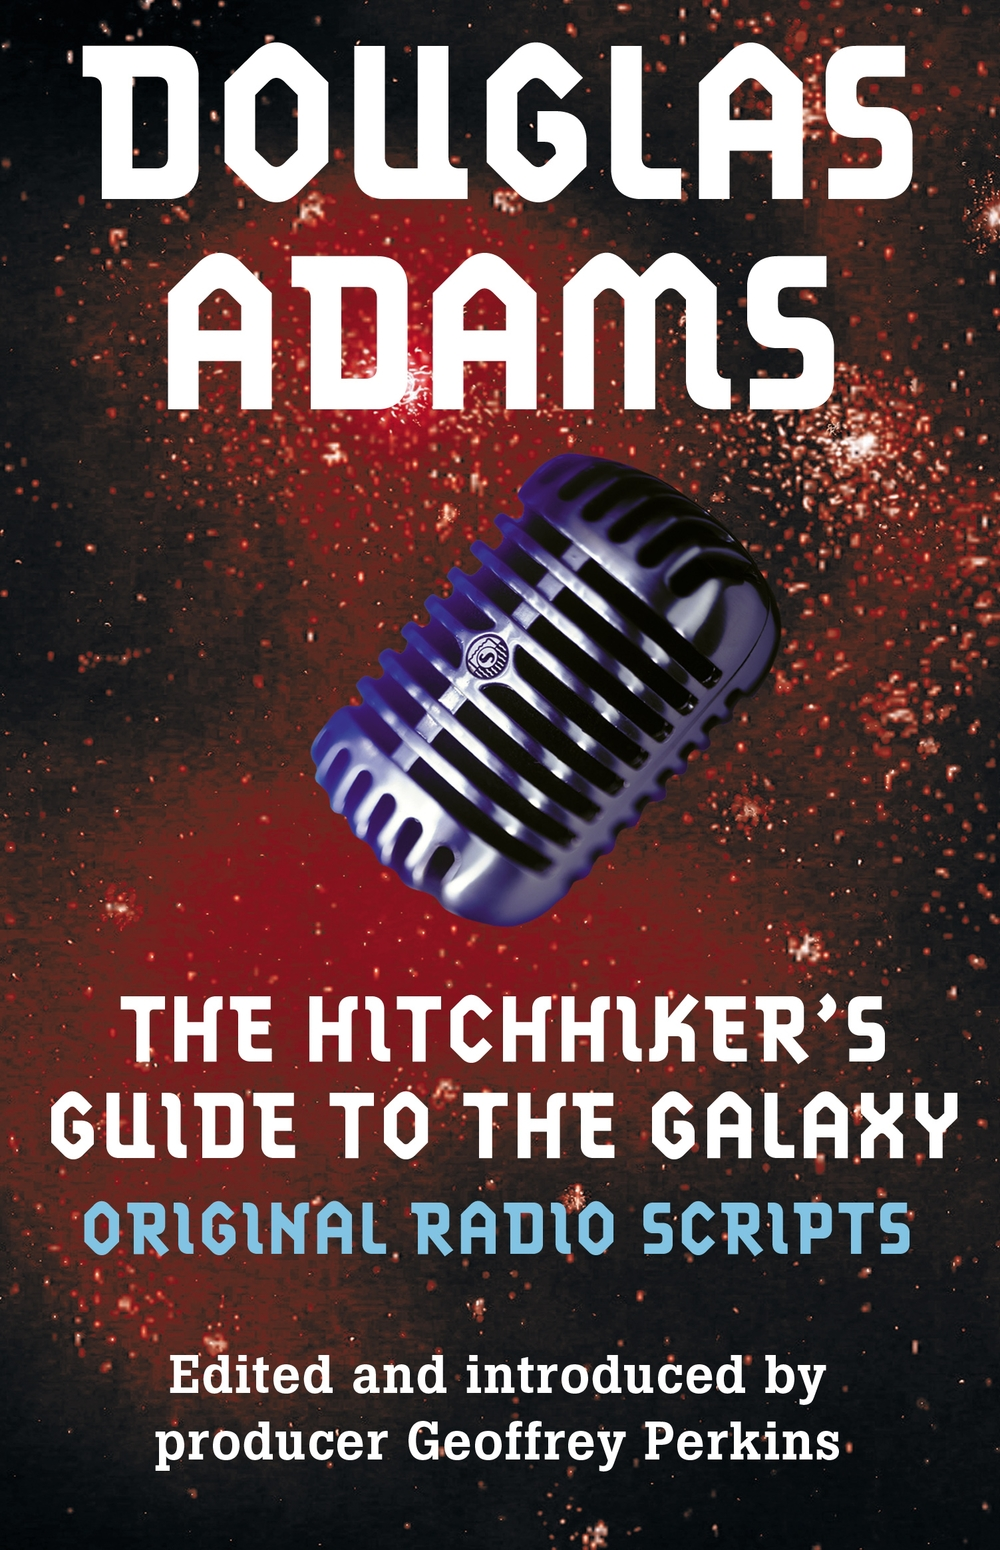 thehitchhikersguidetothegalaxyoriginalradioscripts[1]